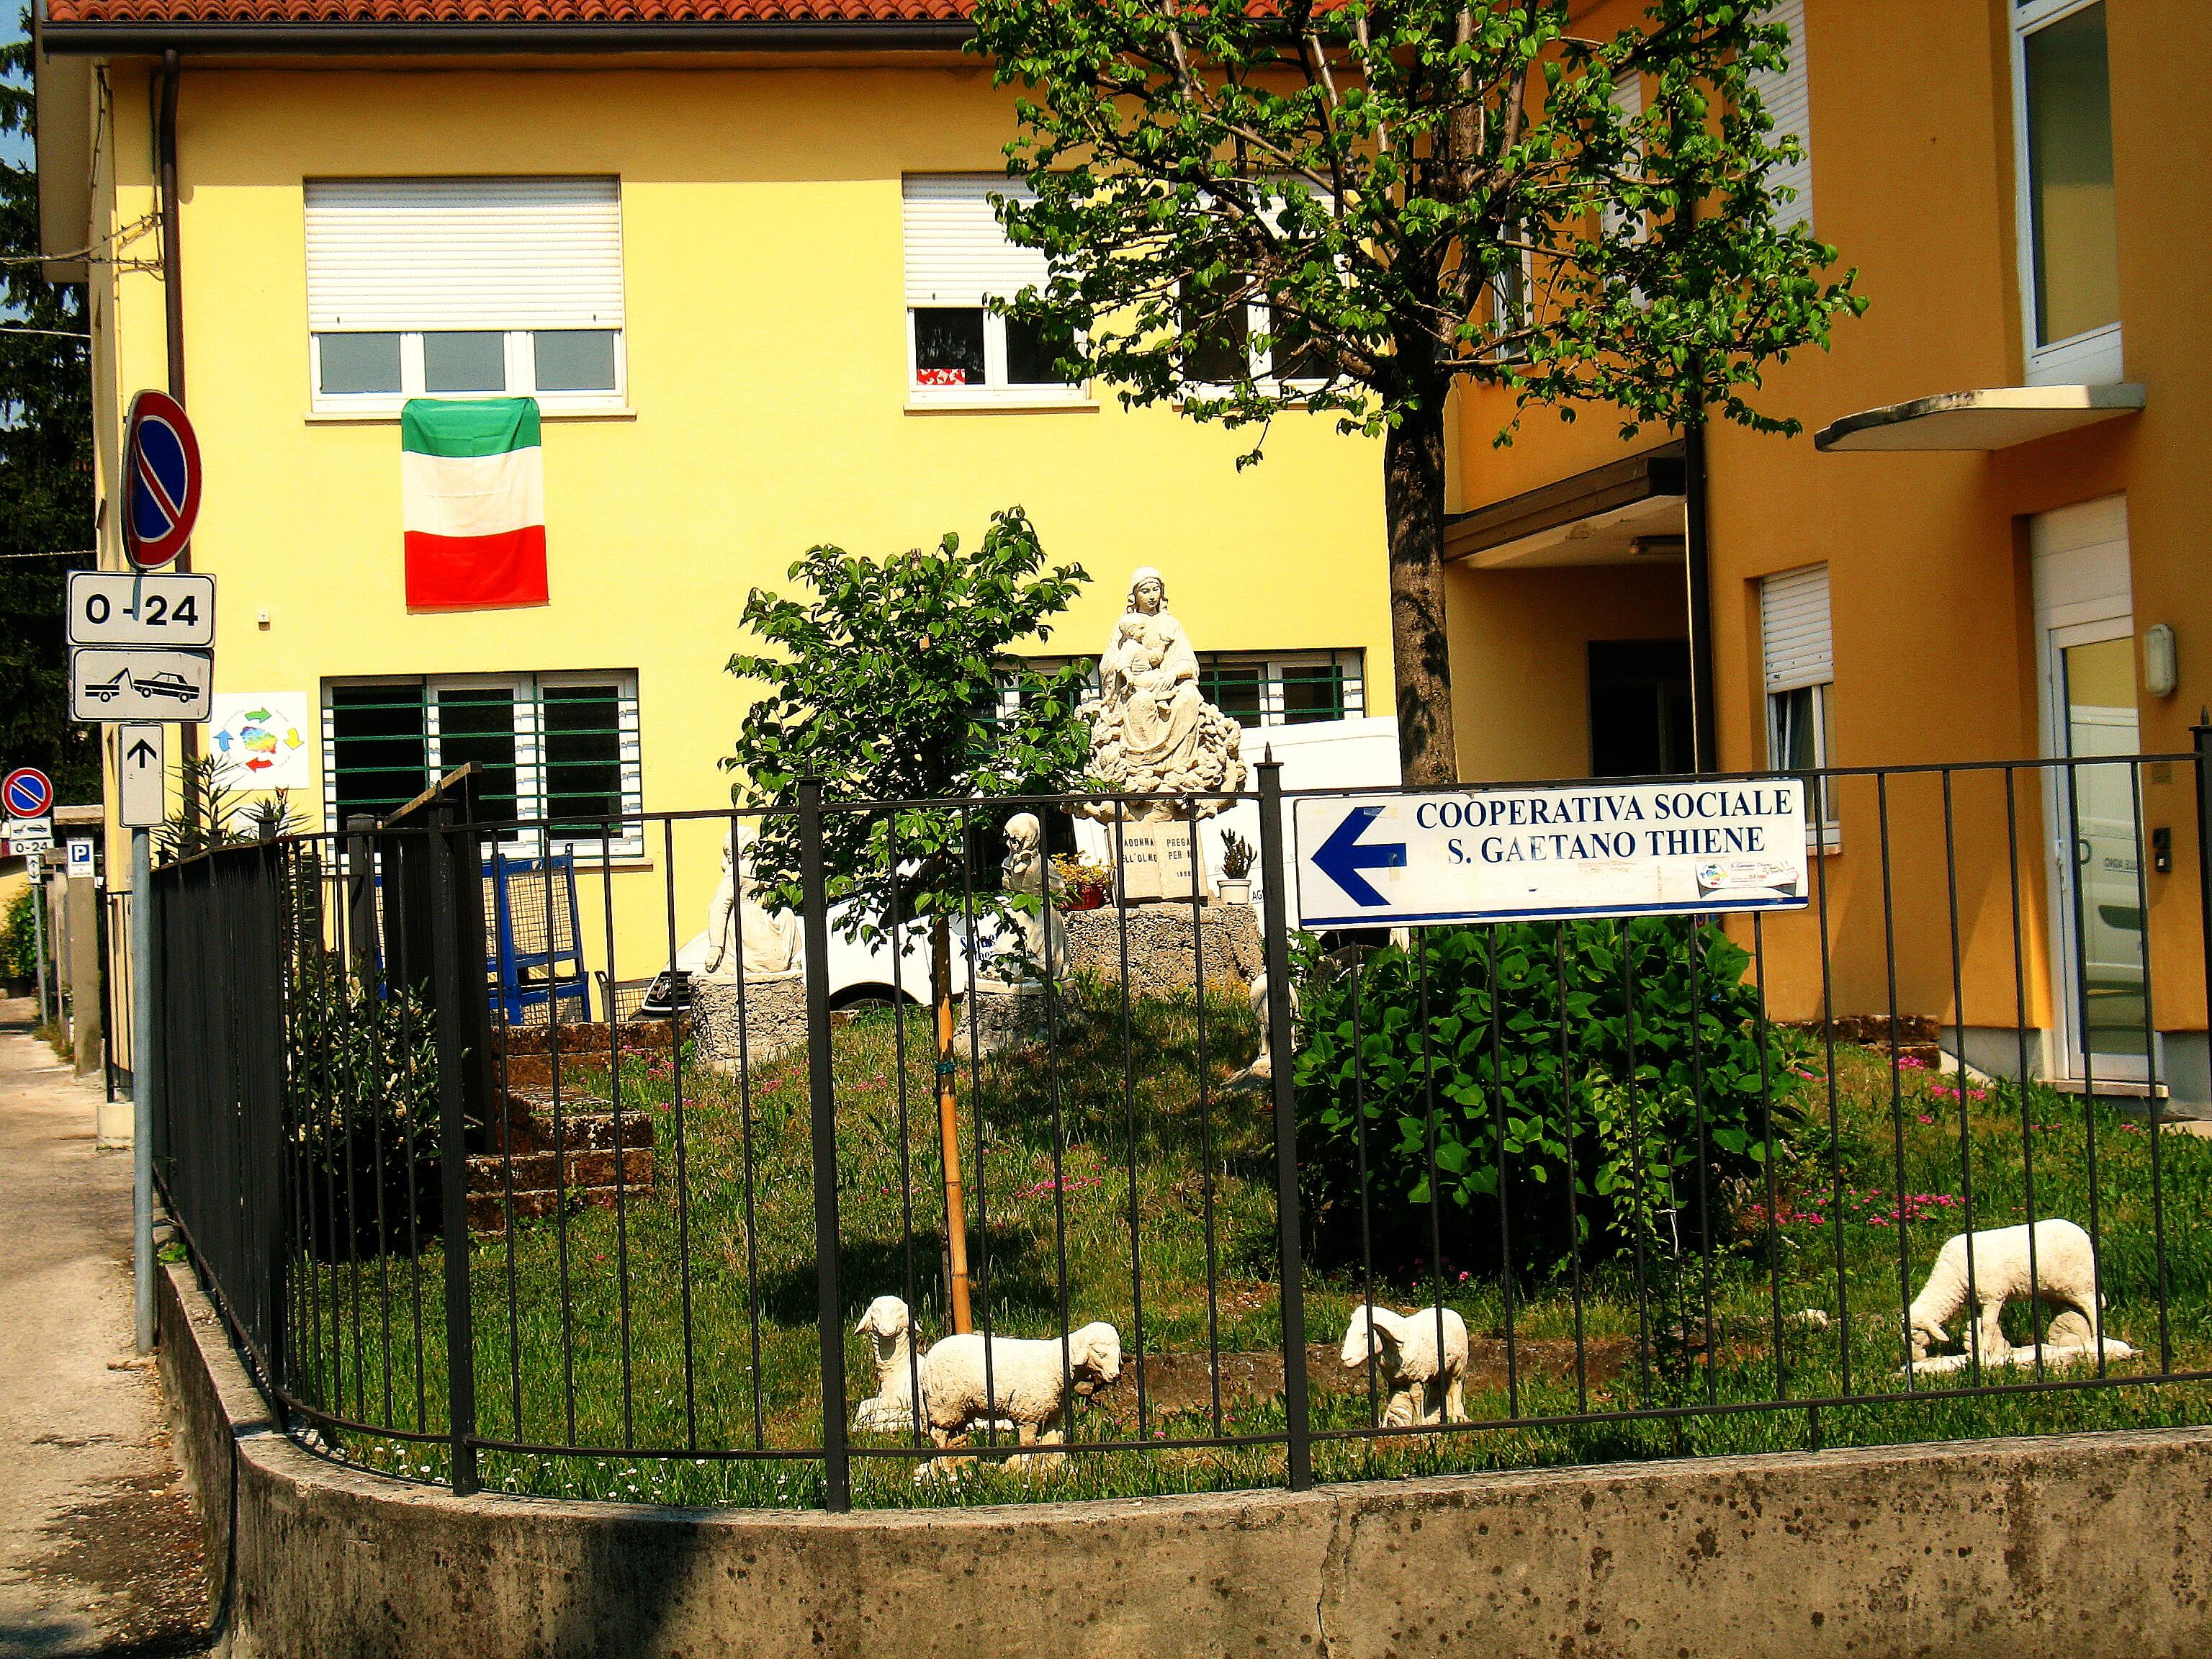 San Gaetano Thiene Coop. Sociale